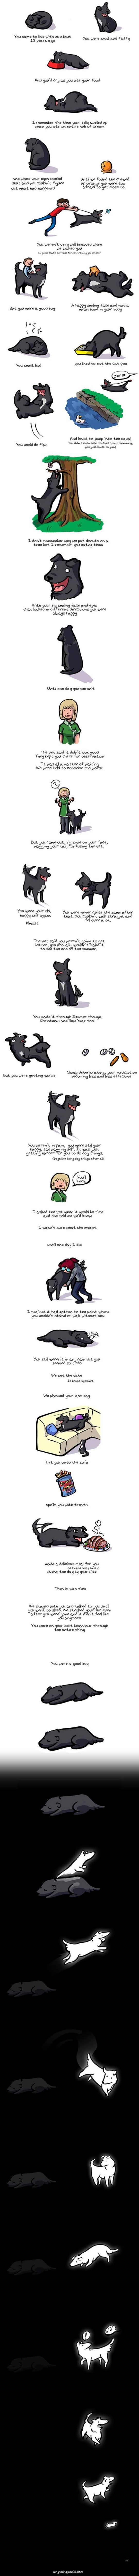 Illustration Of Dog 4